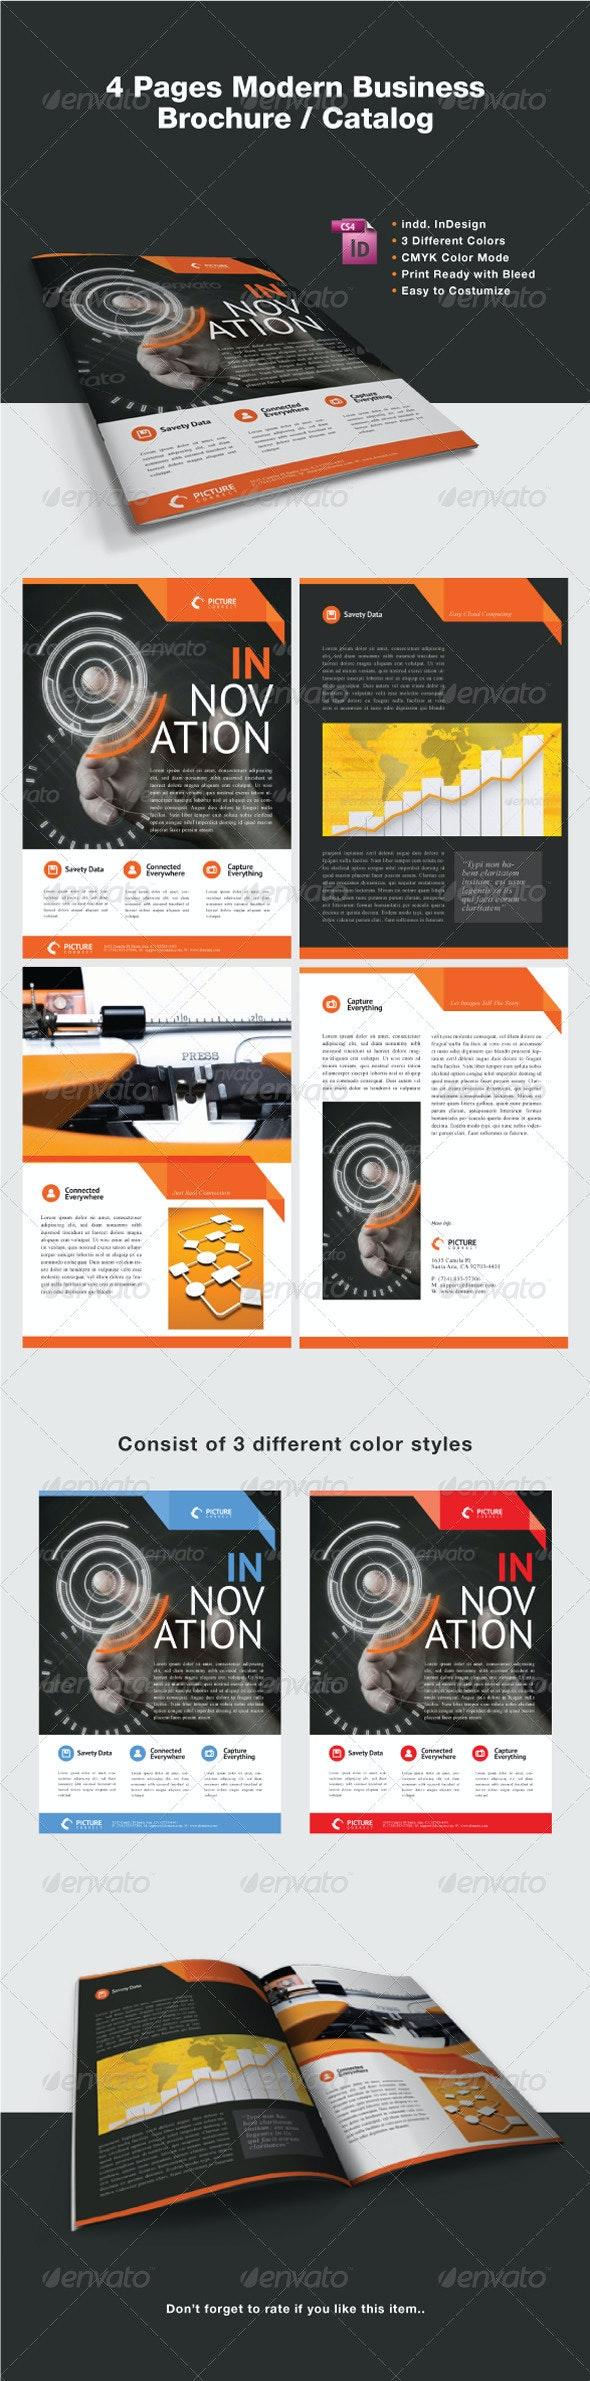 Modern Business Brochure / Catalog - Corporate Brochures